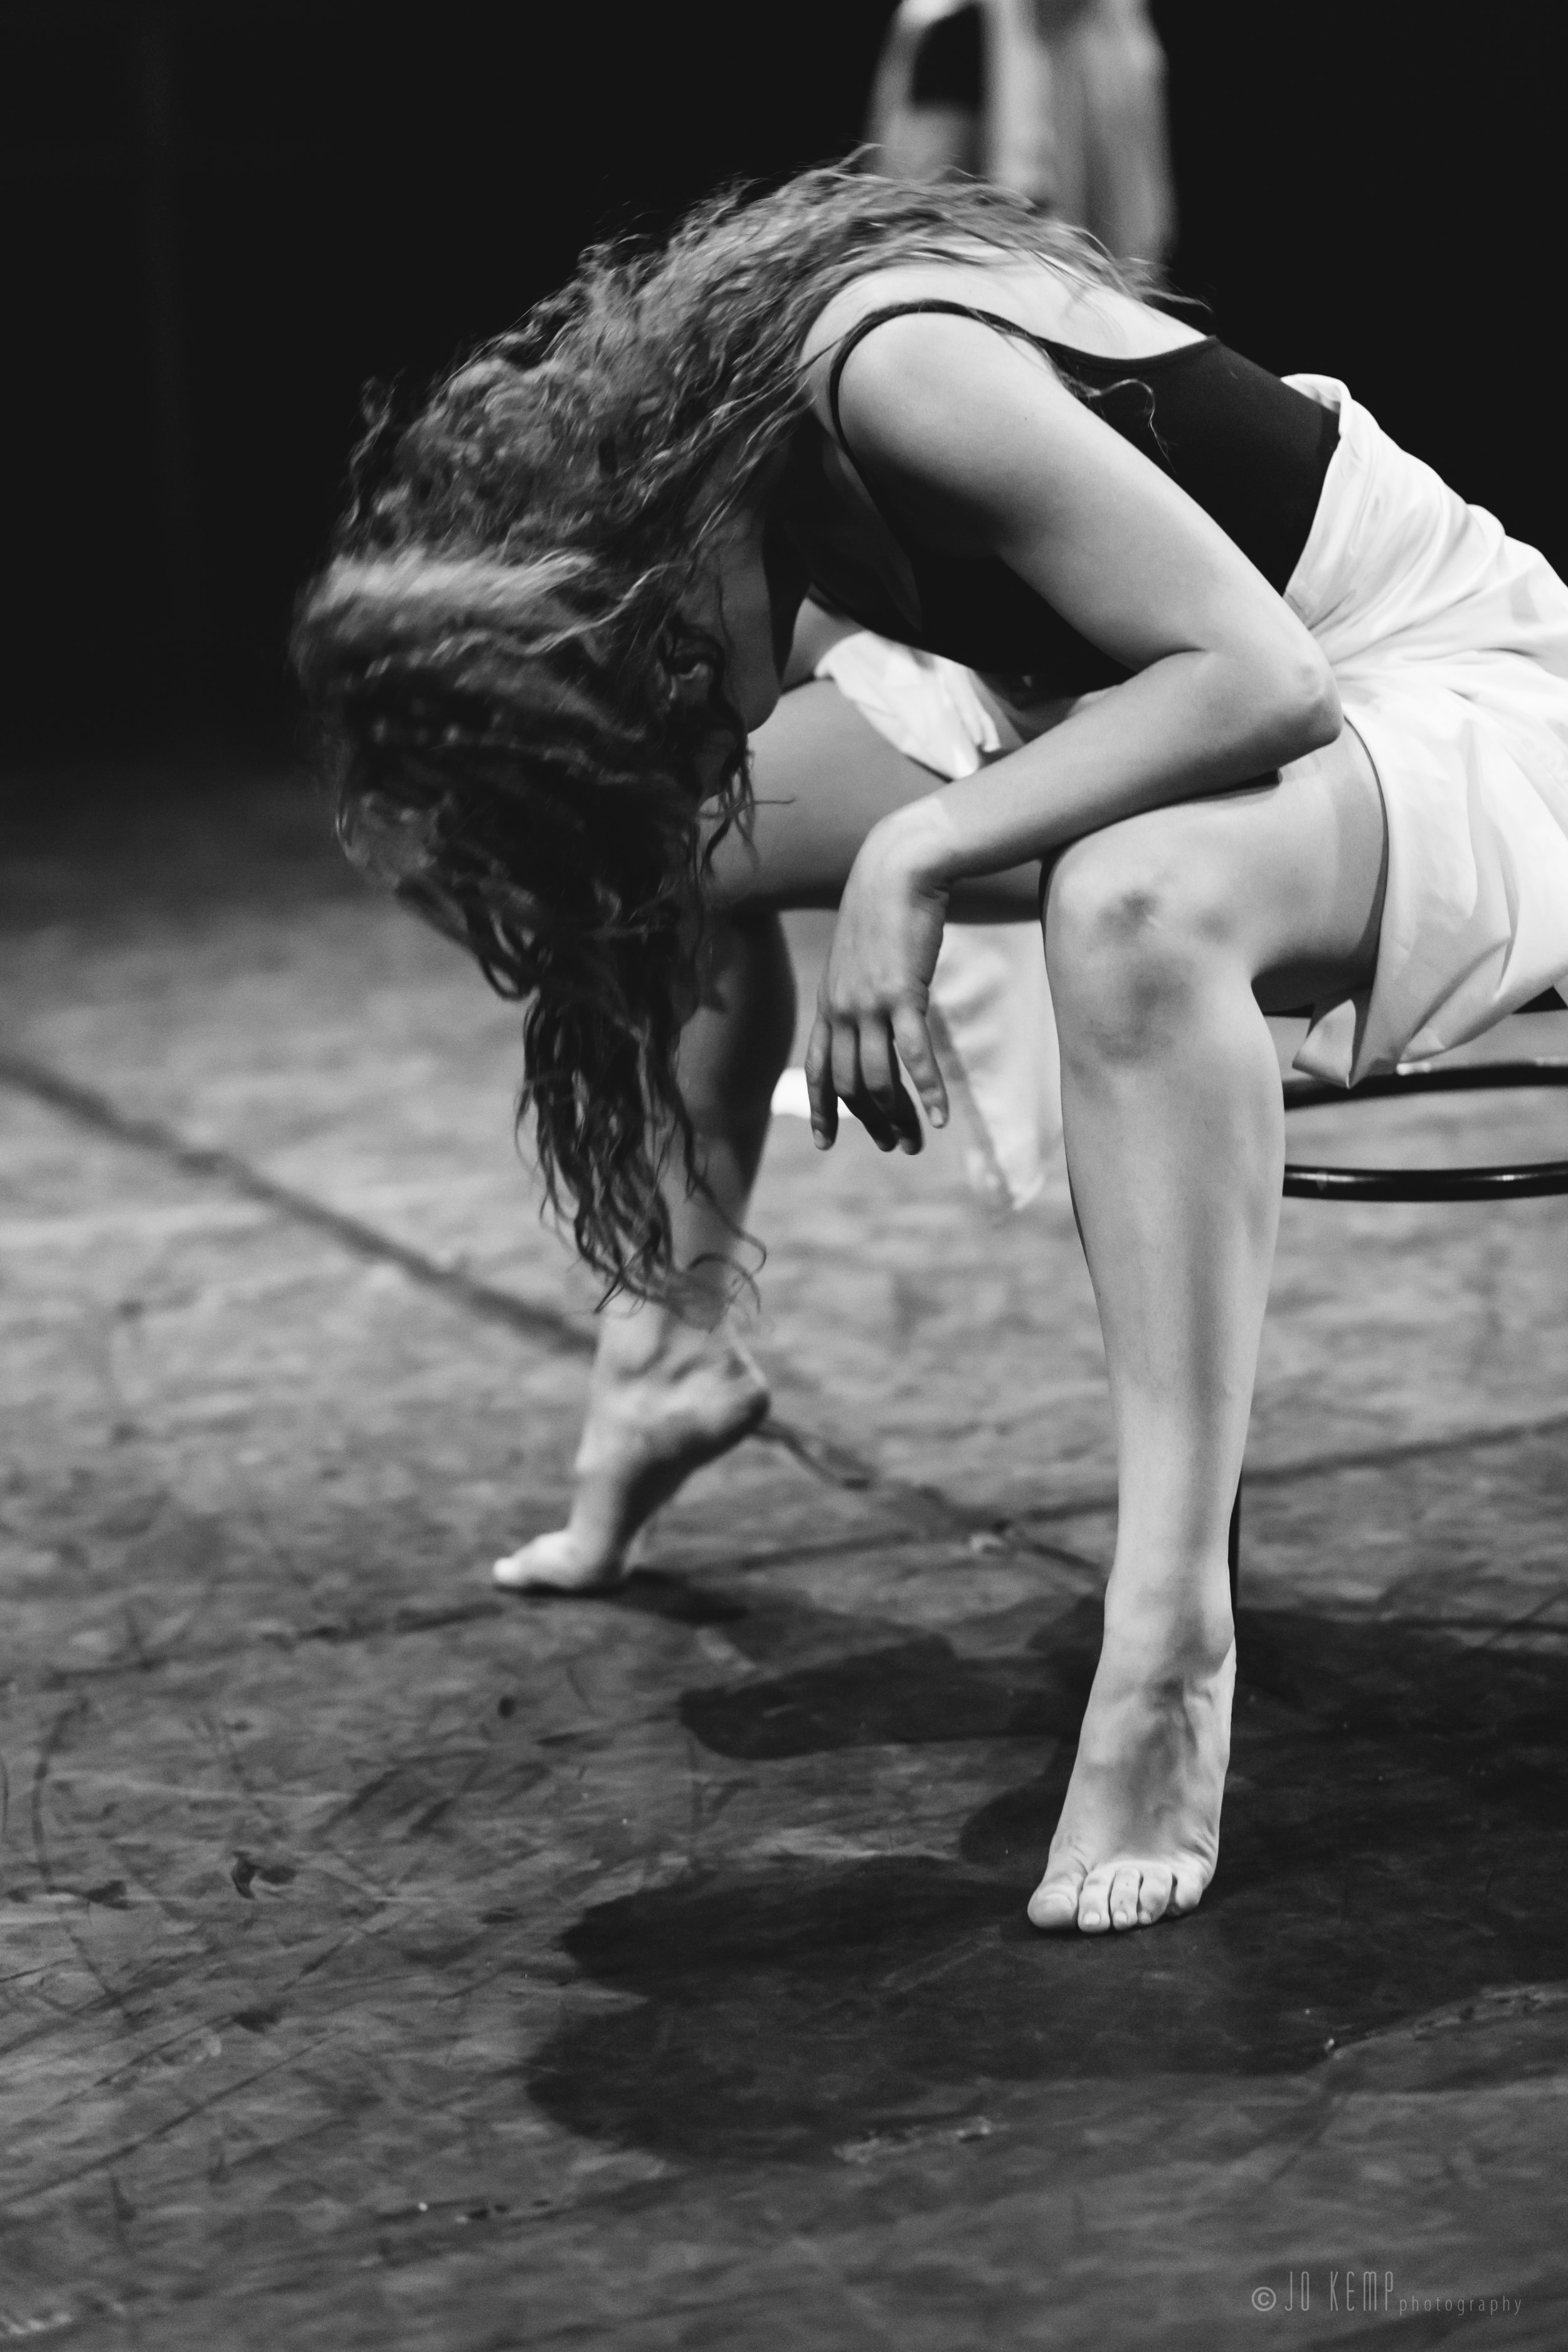 iab dance dancedance-may 16-7737.jpg